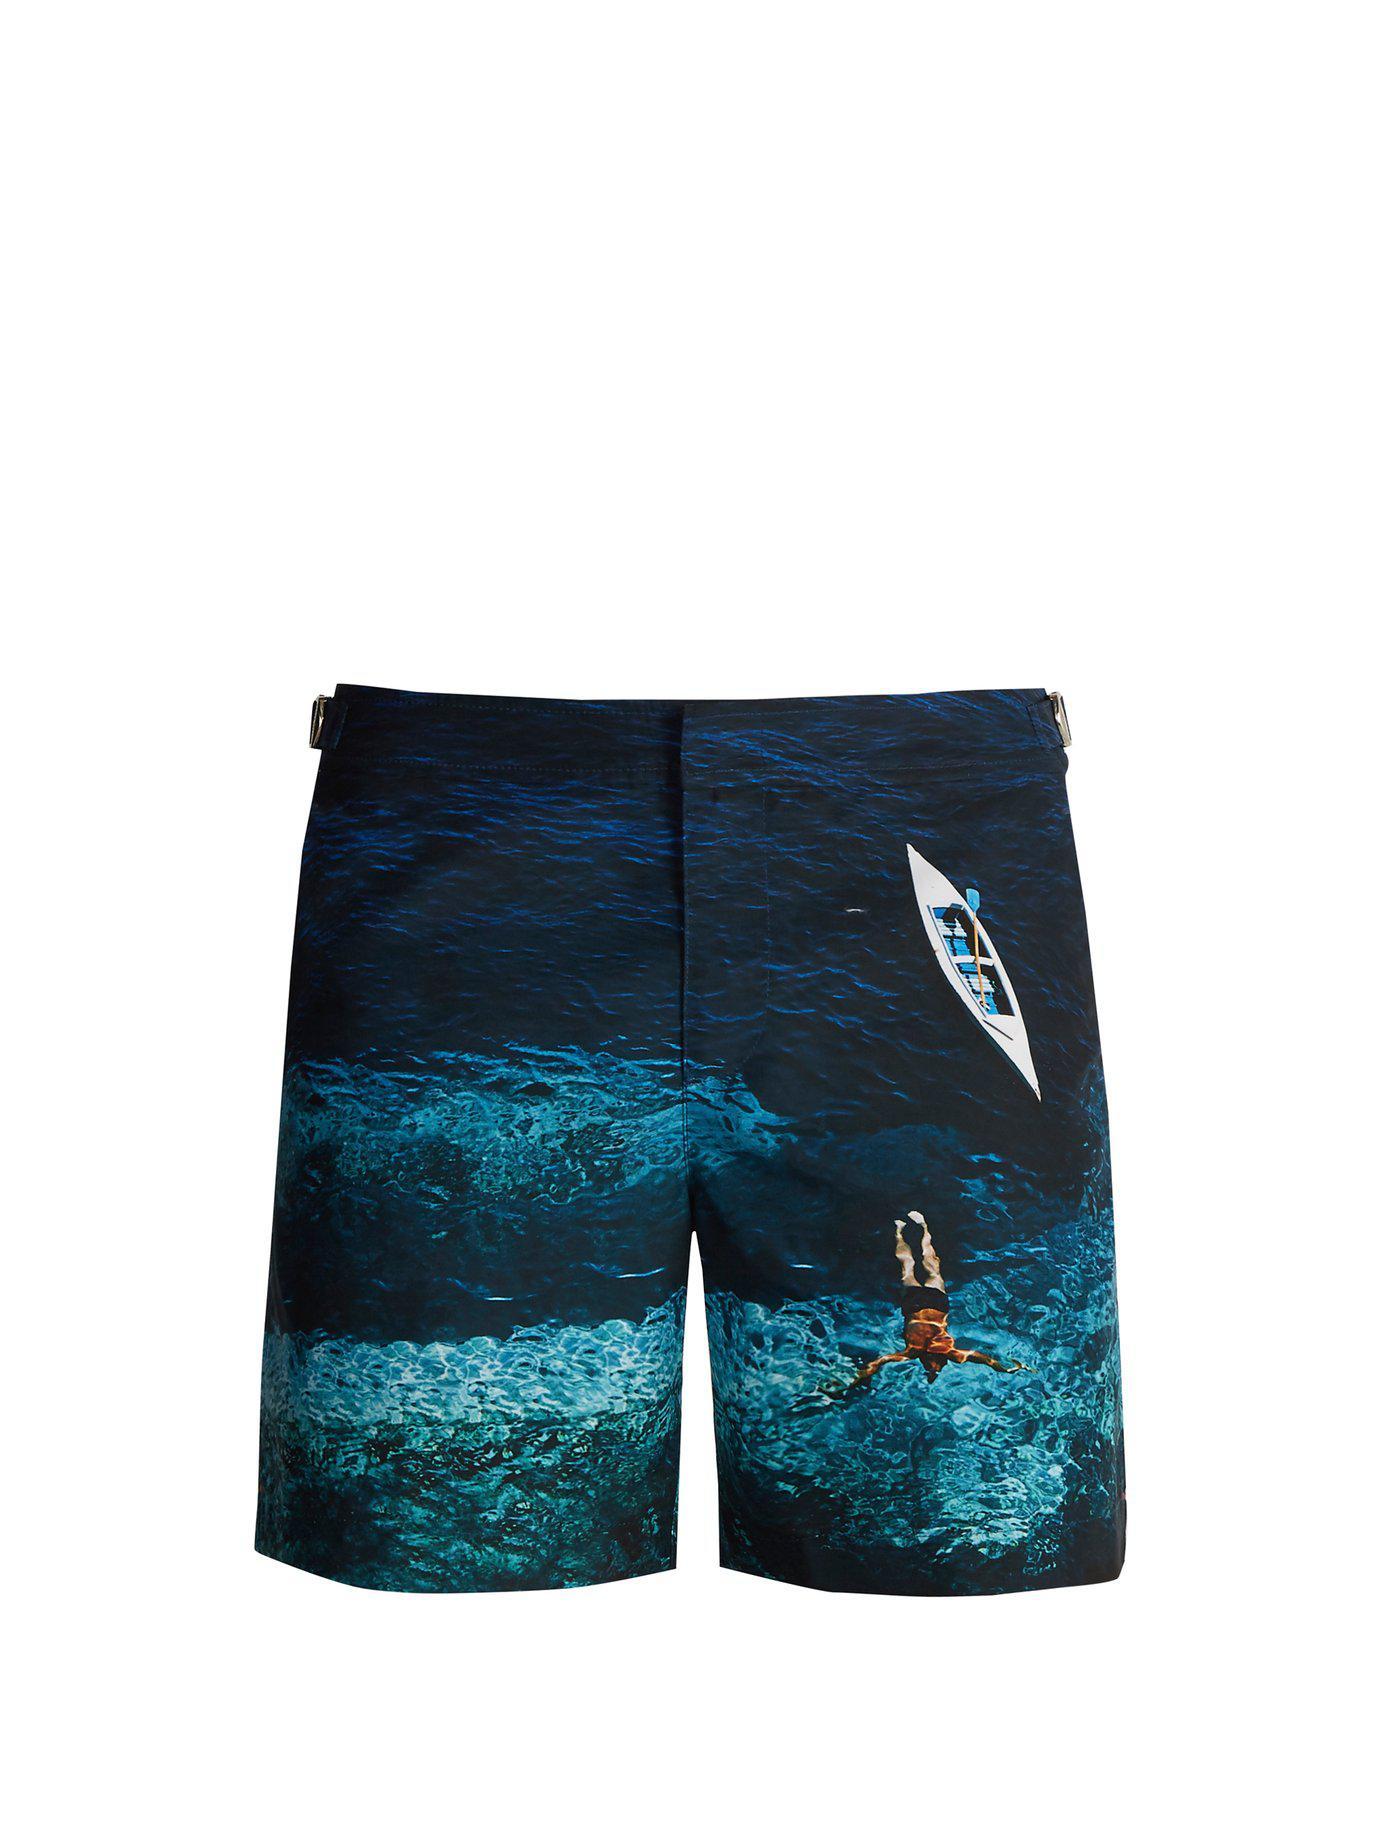 e3b4c54cdecf2 Lyst - Orlebar Brown Bulldog Photographic Wave-print Swim Shorts in ...